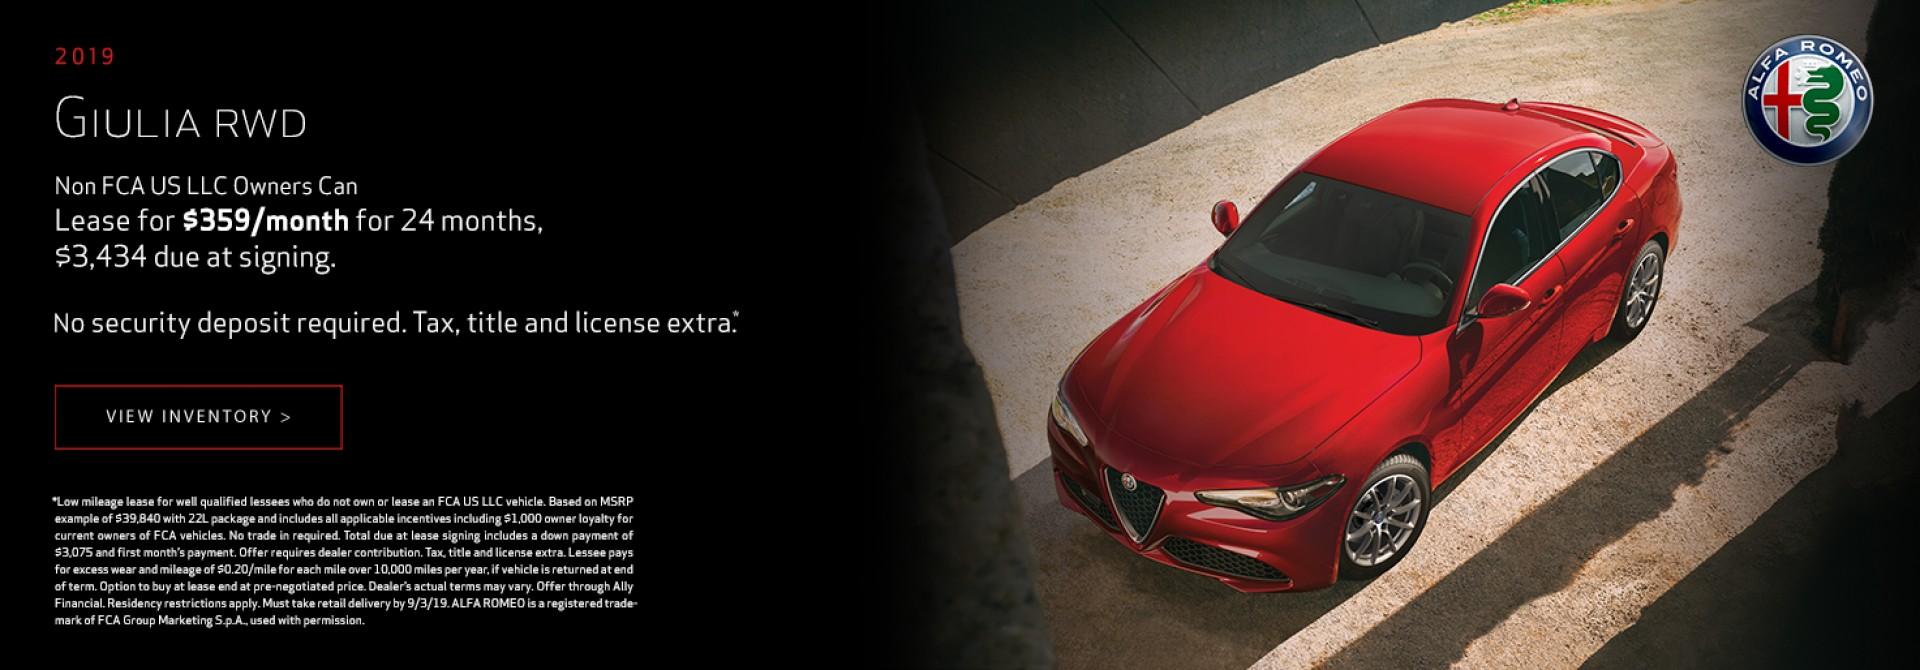 AlfaRomeo-2019-Giulia-RWD-Lease-NY-LA-MIA-Regional-August-Tile-Dig-1400x514